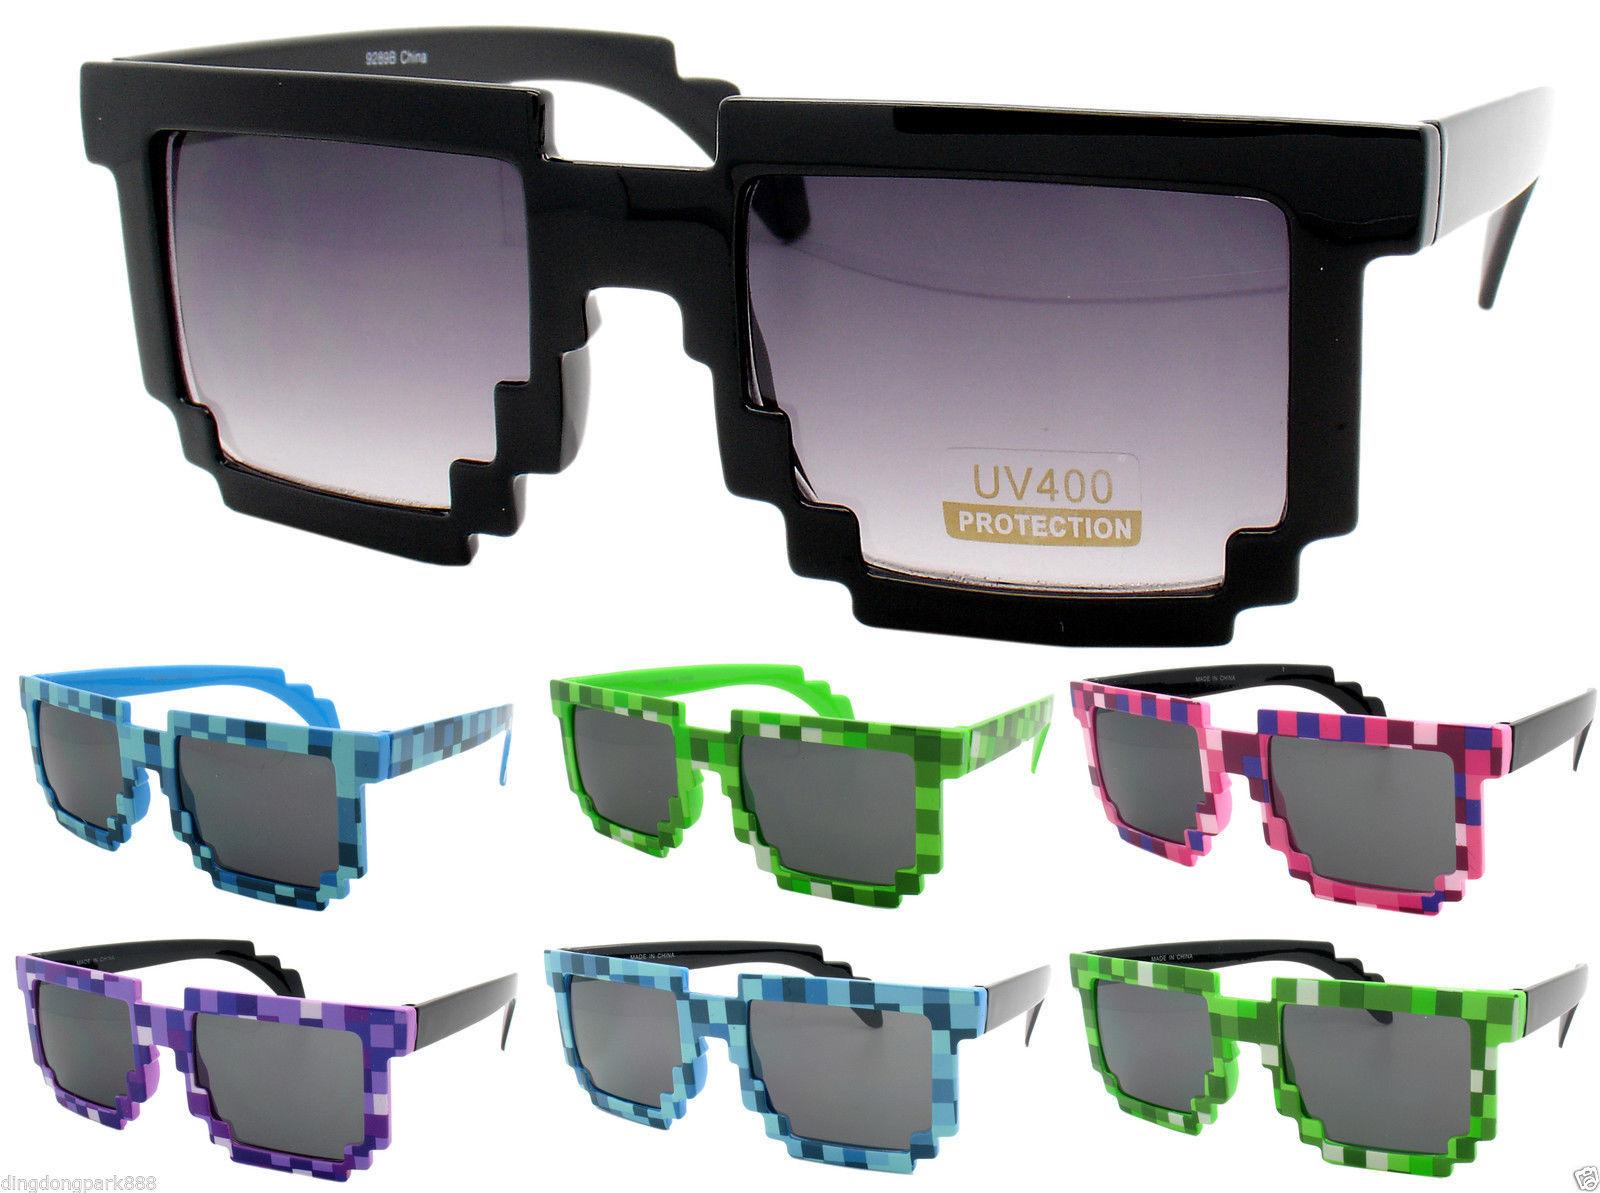 607ad9209dcf Black Pixel 8 Bit Retro Sunglasses Nerd Geek and 37 similar items. S l1600